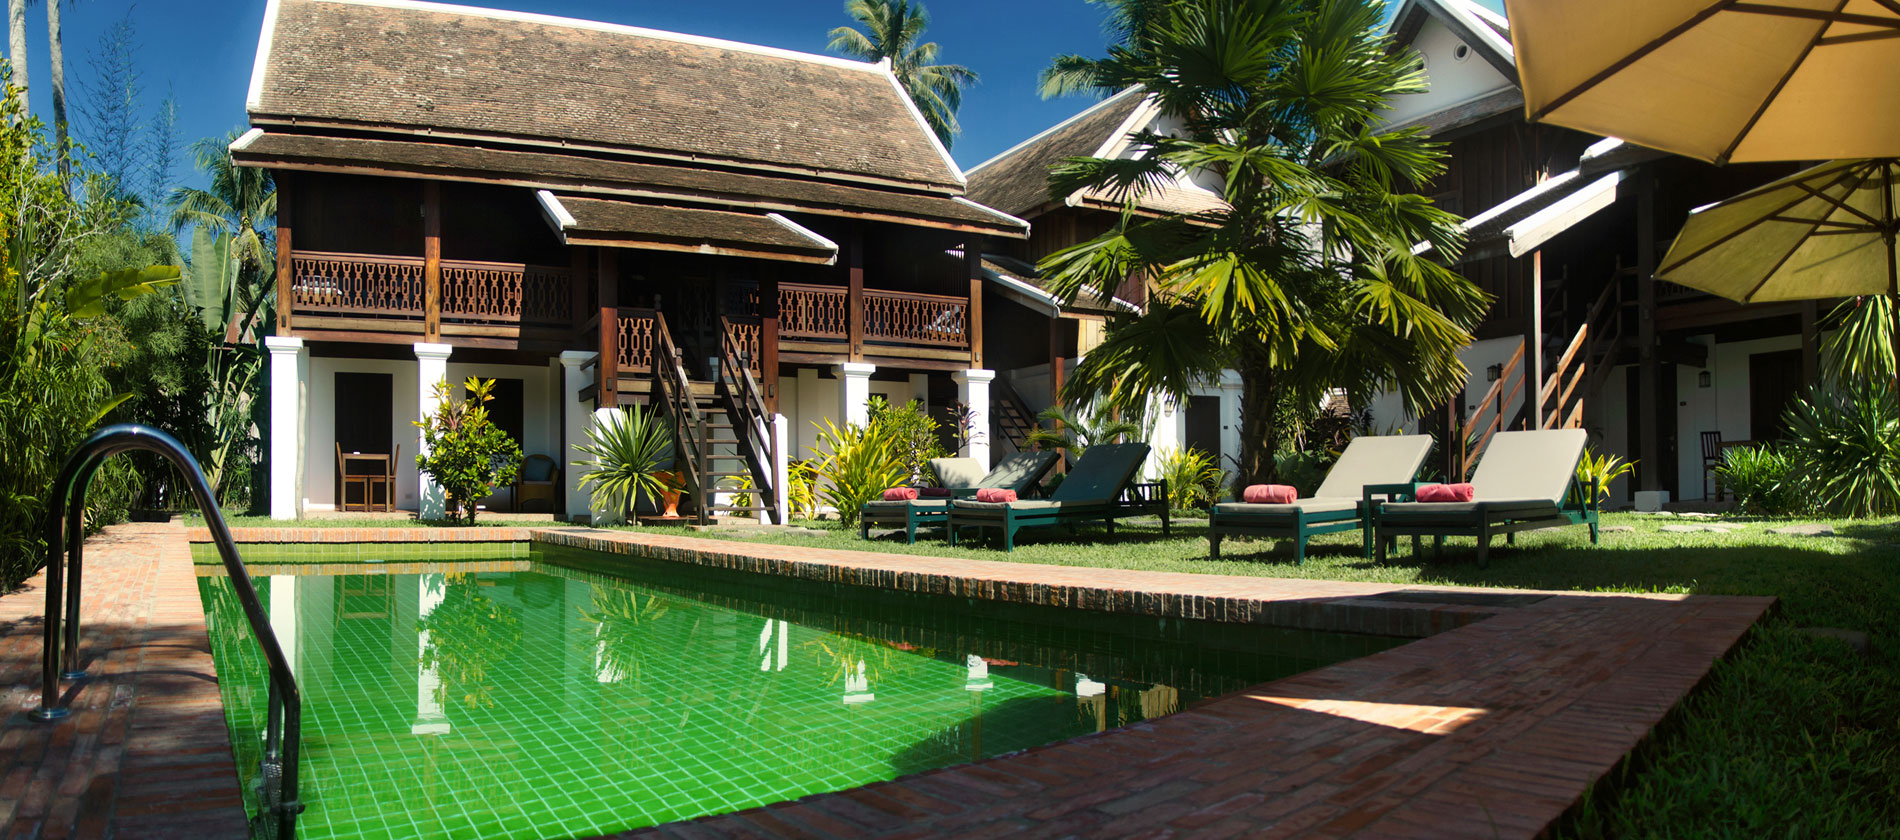 villa maydou hotel in laos enchanting travels. Black Bedroom Furniture Sets. Home Design Ideas